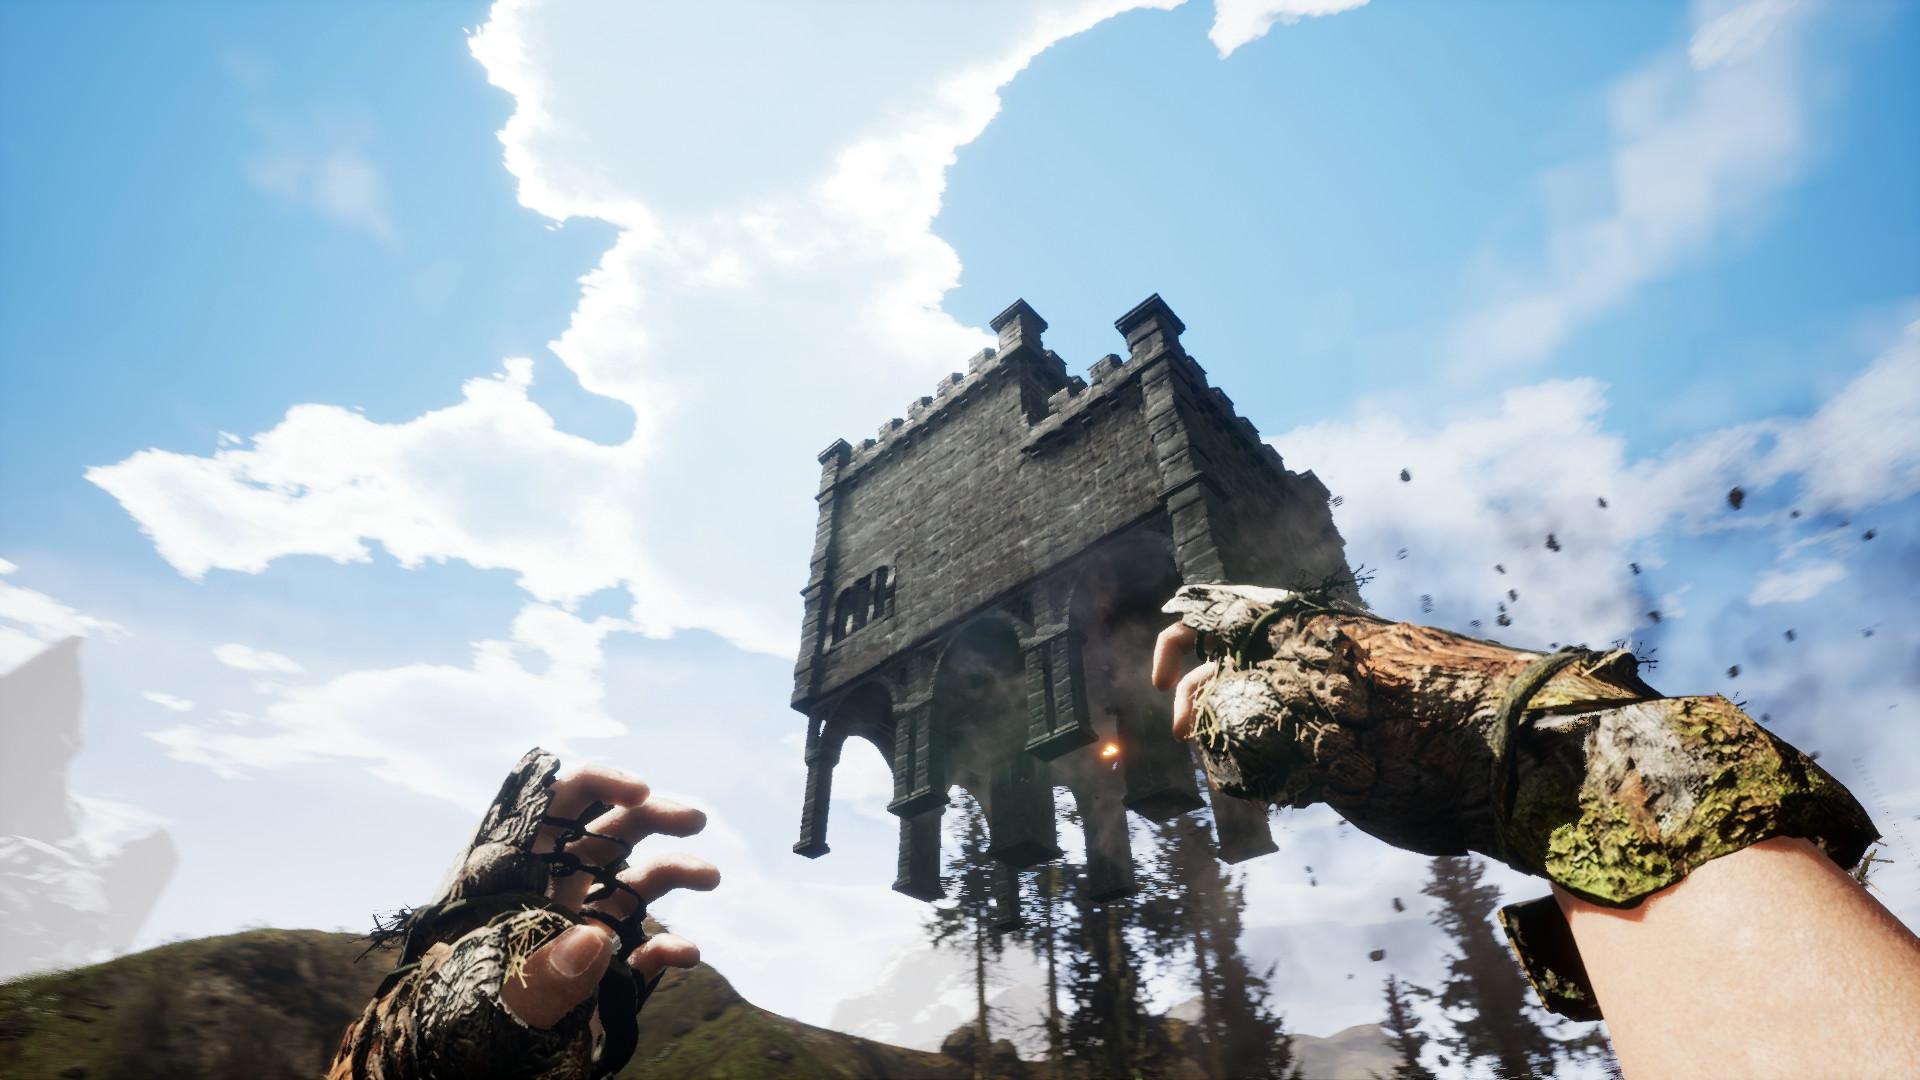 Citadel Forged with Fire da graczom ogromną swobodę